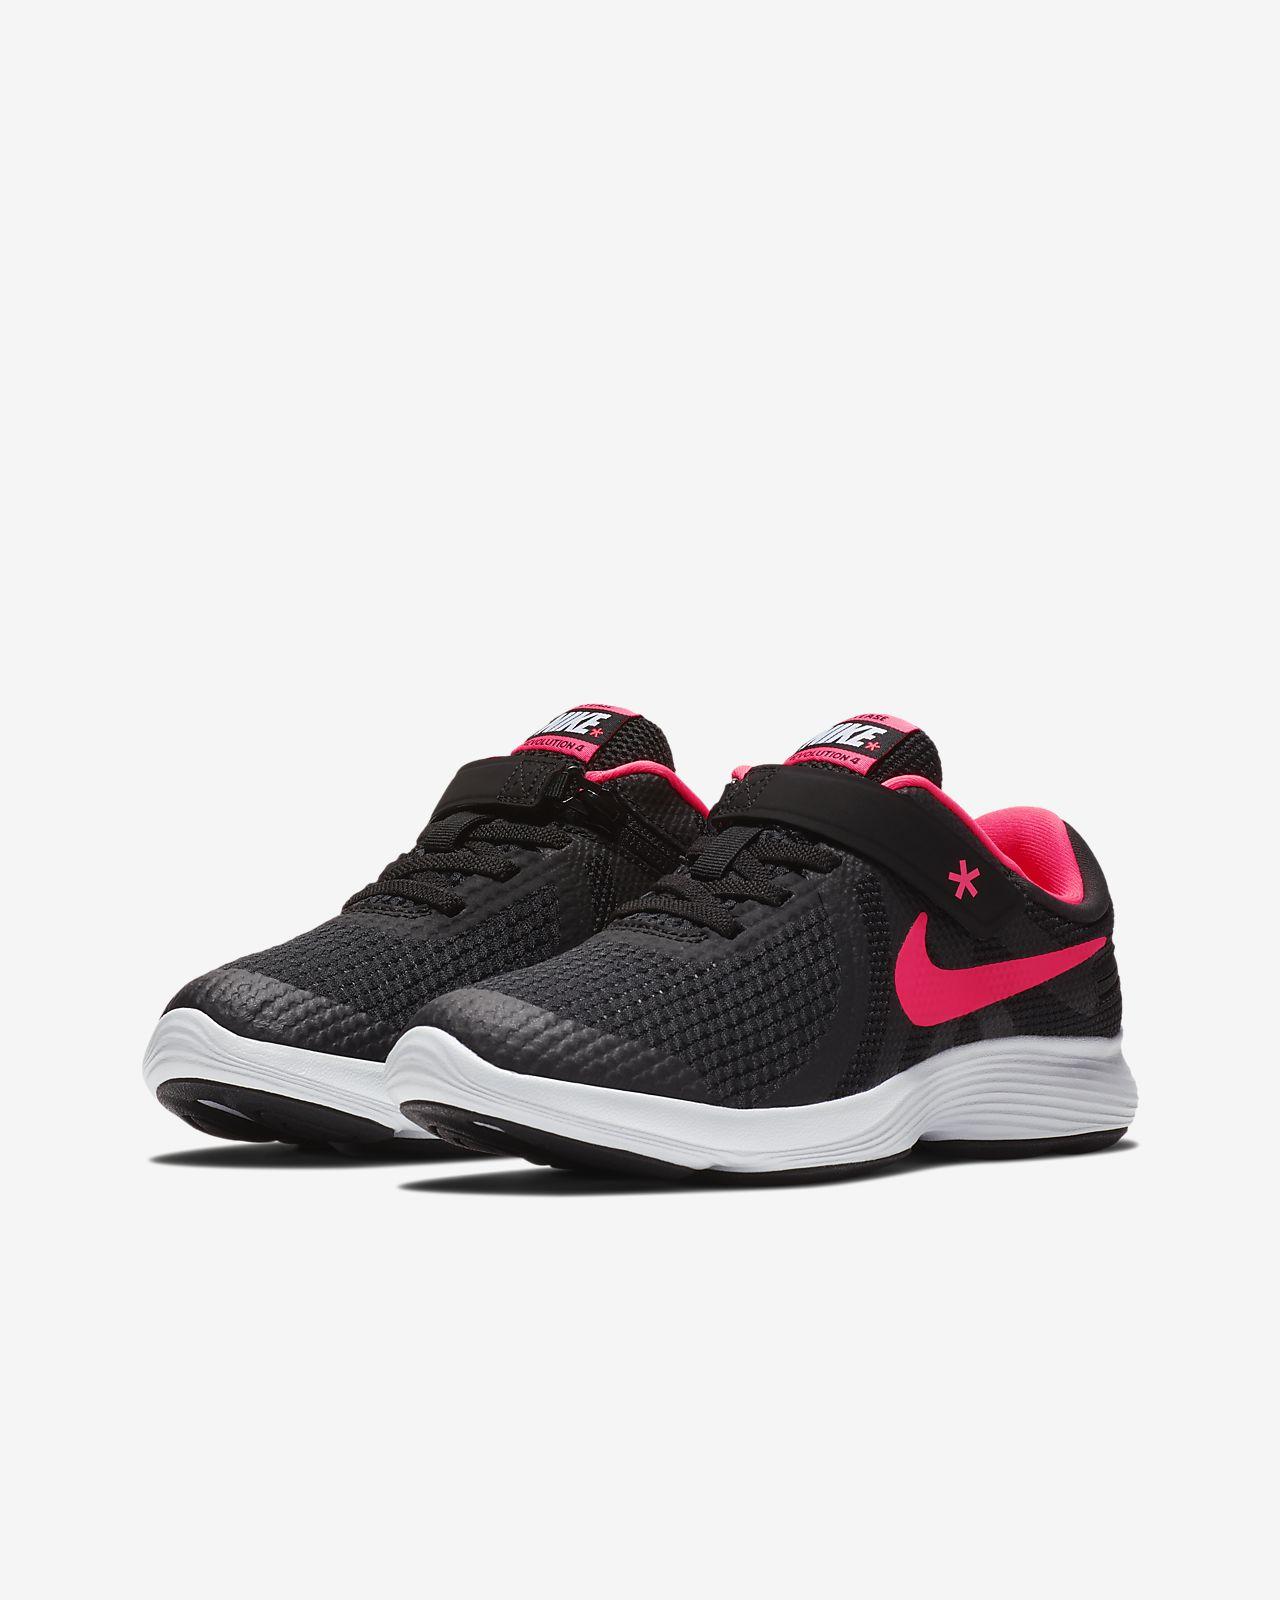 60e30ed159e0 Nike Revolution 4 FlyEase Big Kids  Running Shoe. Nike.com